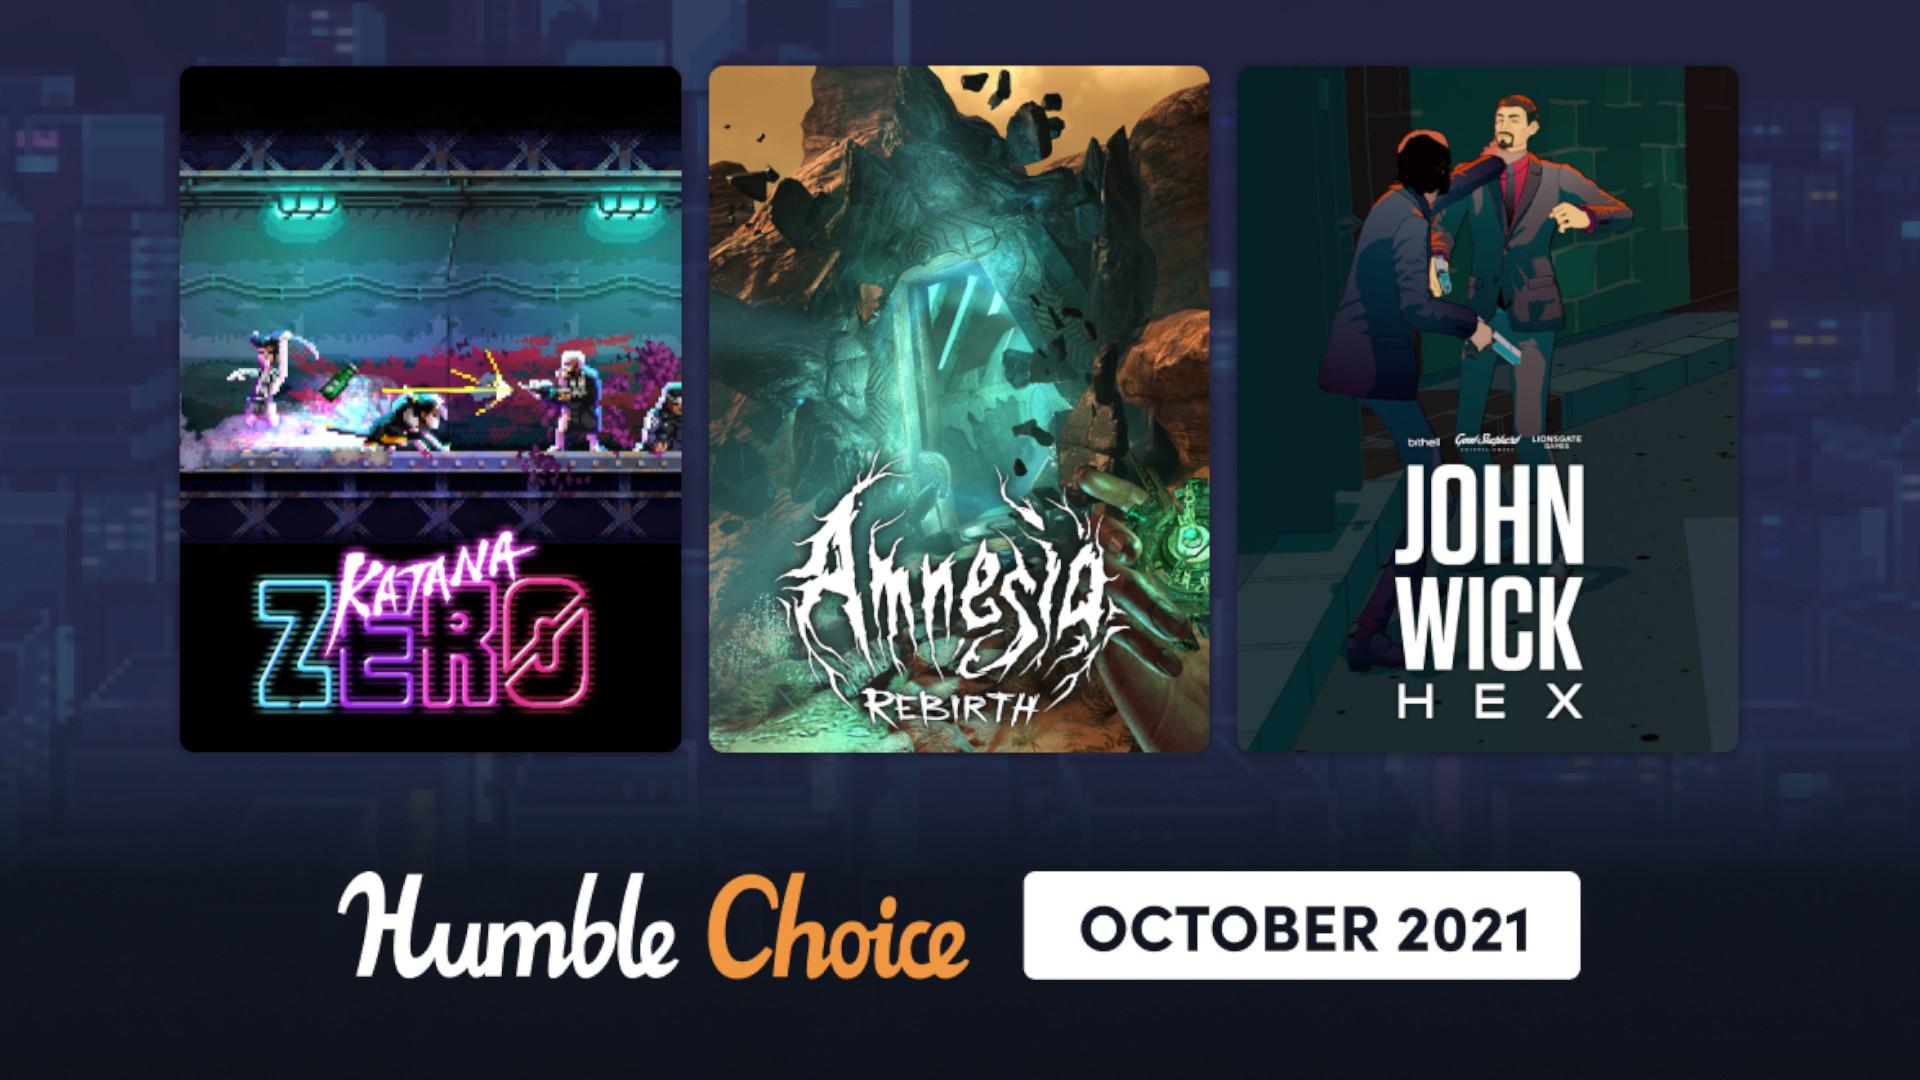 Katana Zero, Amnesia: Rebirth, and John Wick Hex in this month's Humble Choice bundle